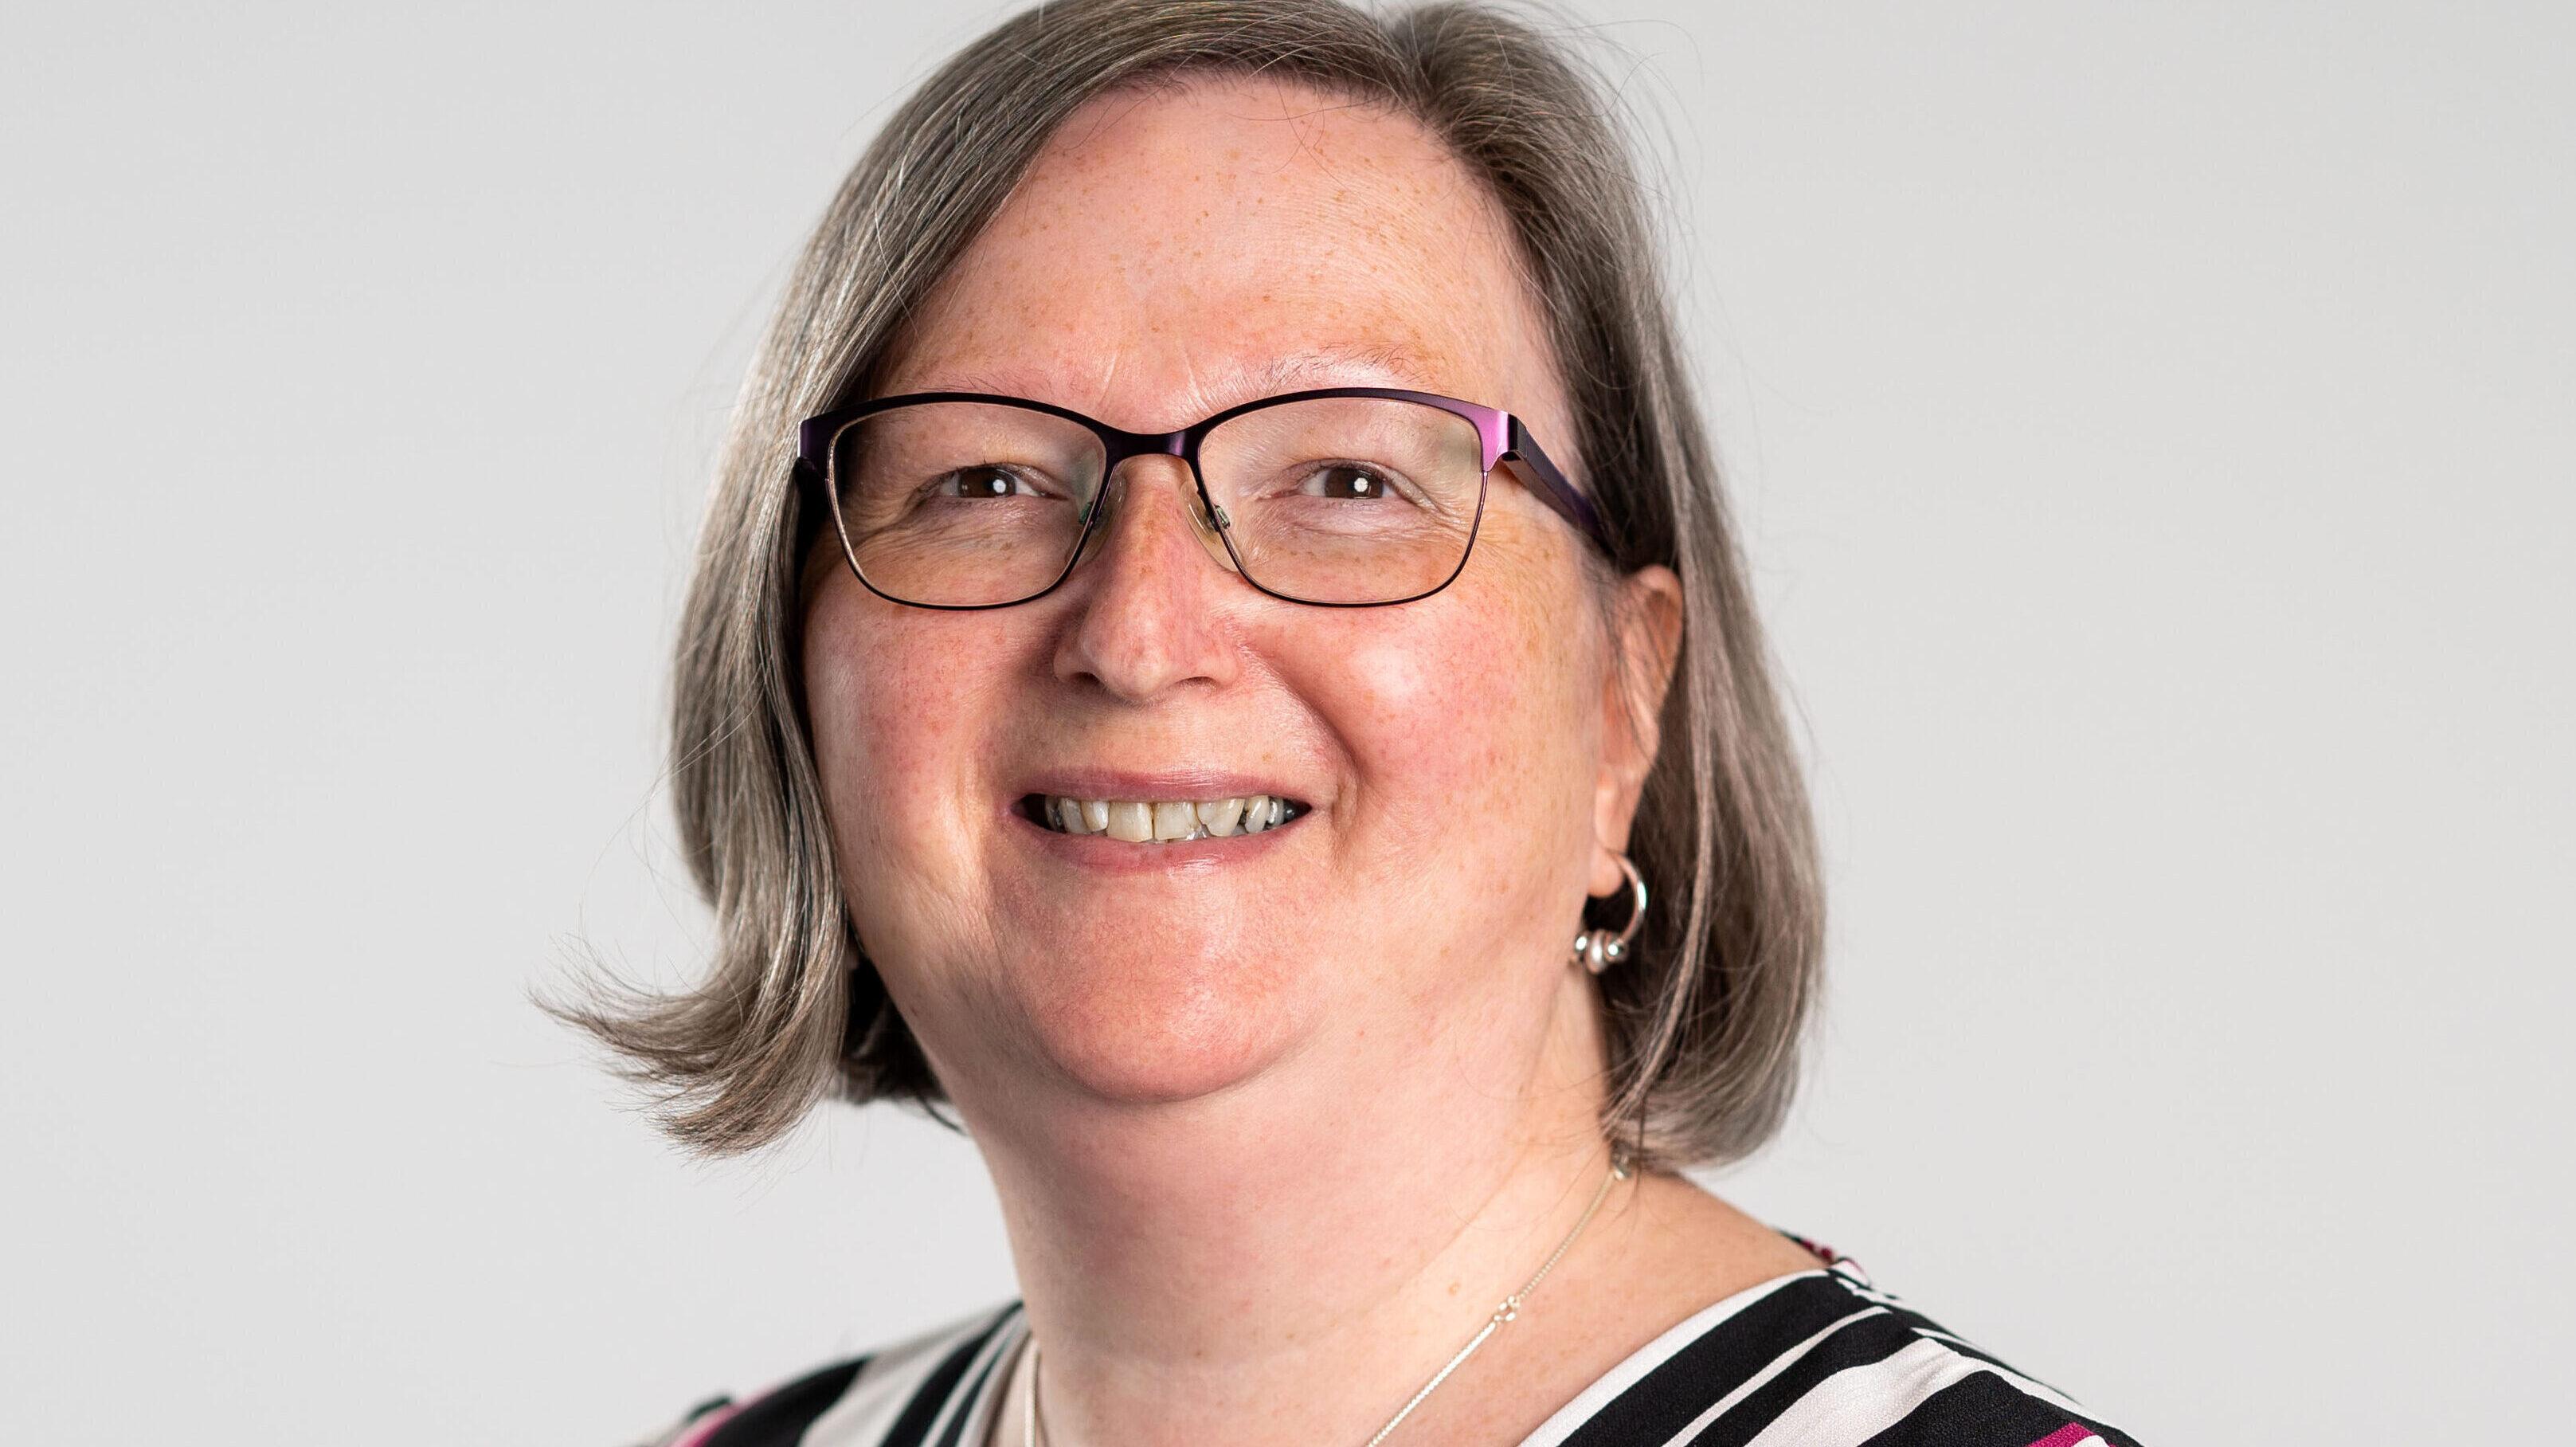 Fiona Watt - Customs Administrator, Bethan Customs Consultancy